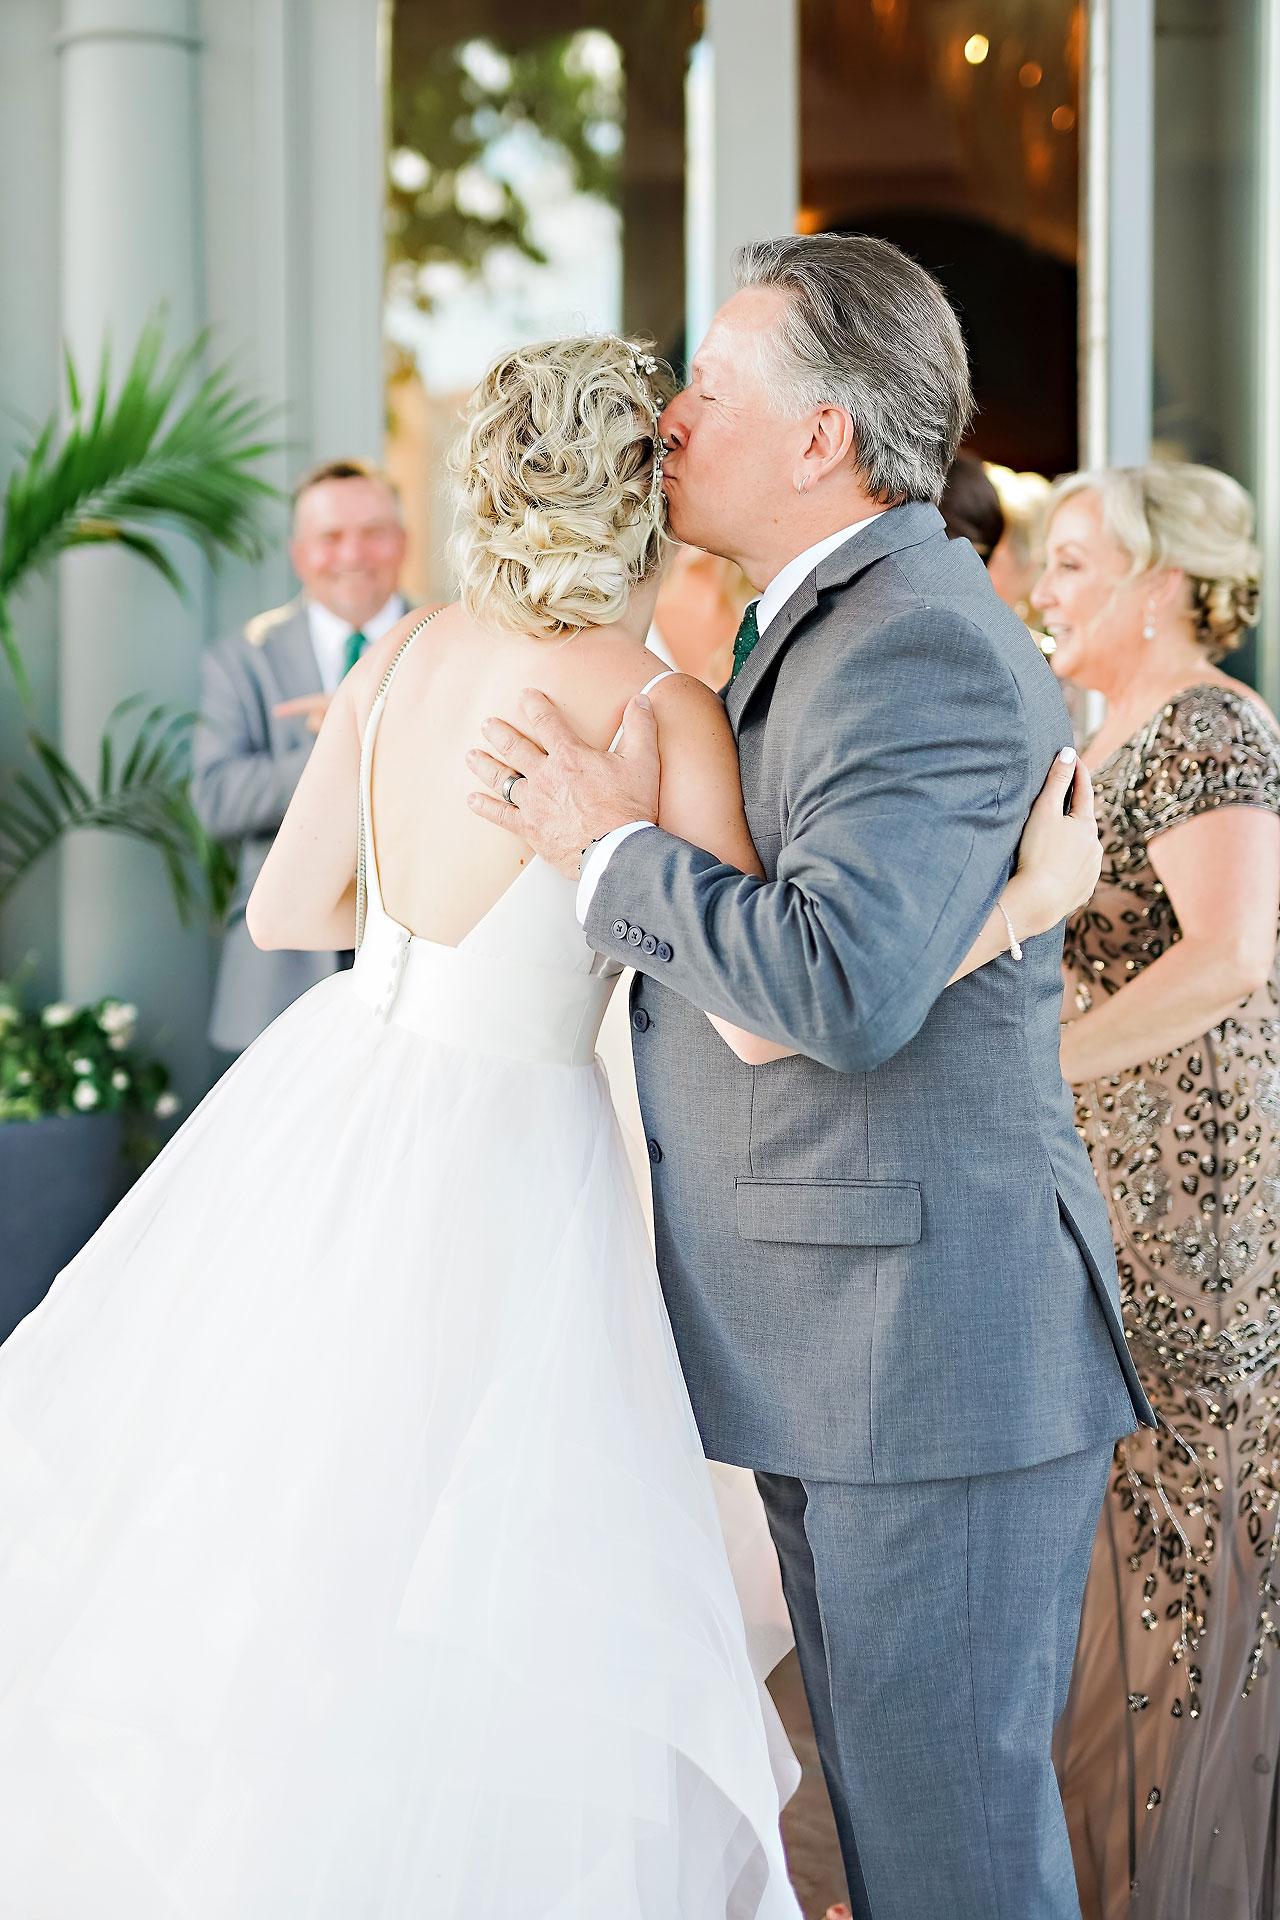 Brylie Jackson Ritz Charles Carmel Indiana Wedding Reception 022